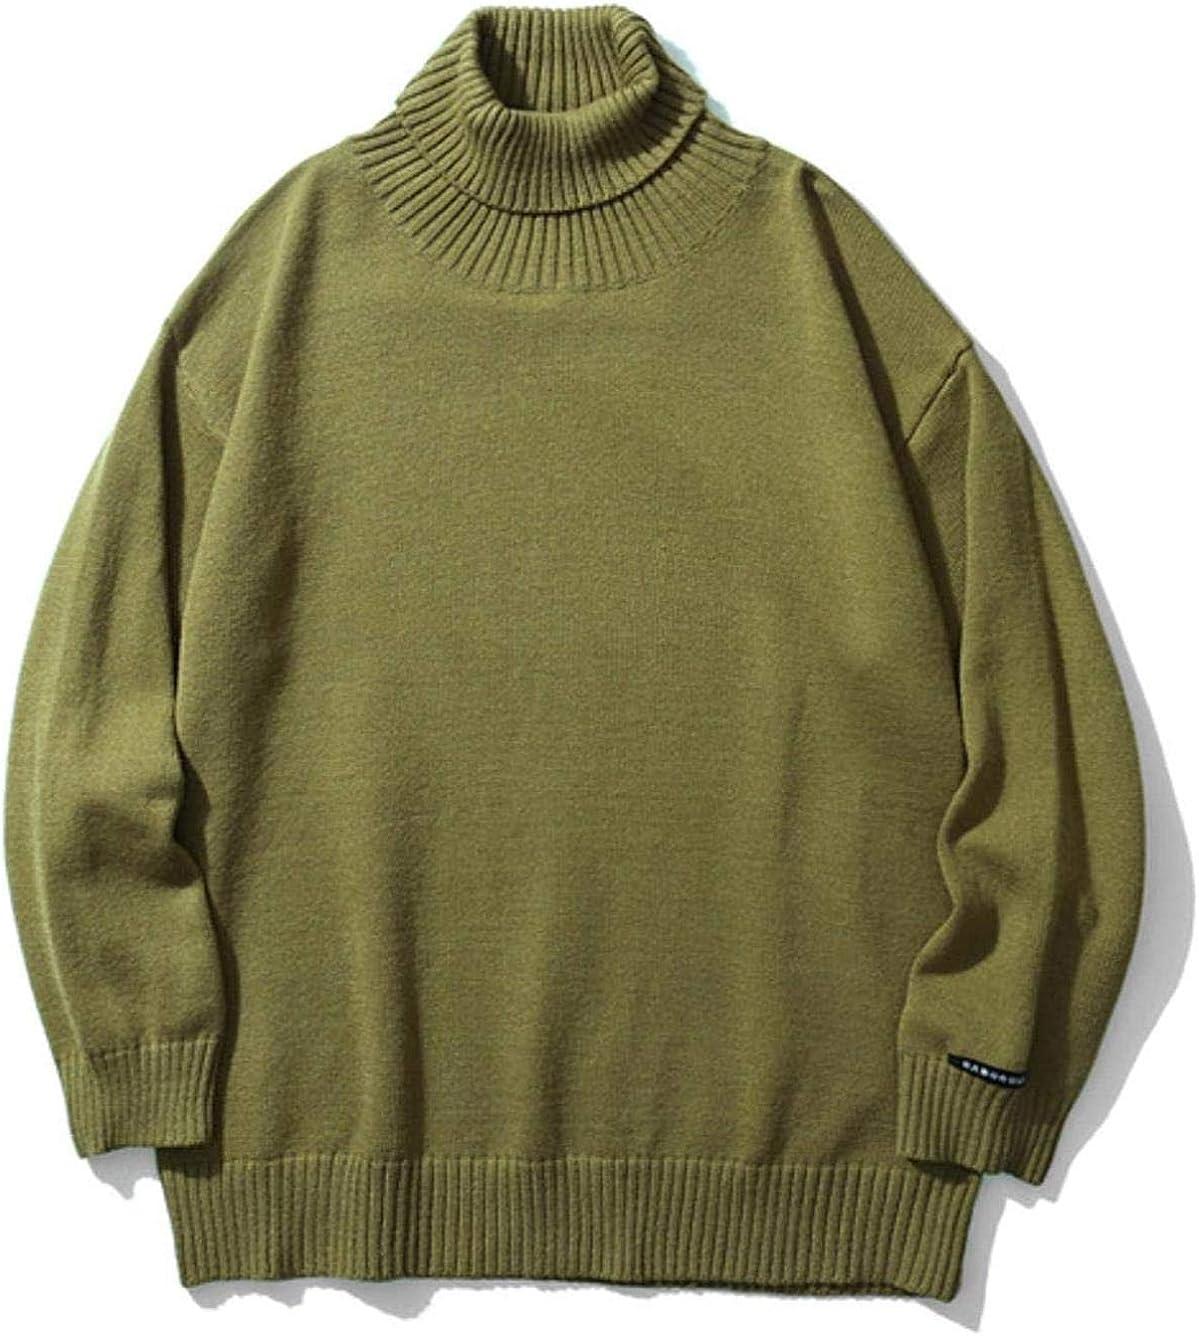 Knitted Pullover Turtleneck Men Sweater Soft Cashmere Wool High Neck Oversize Knitwear Jumper